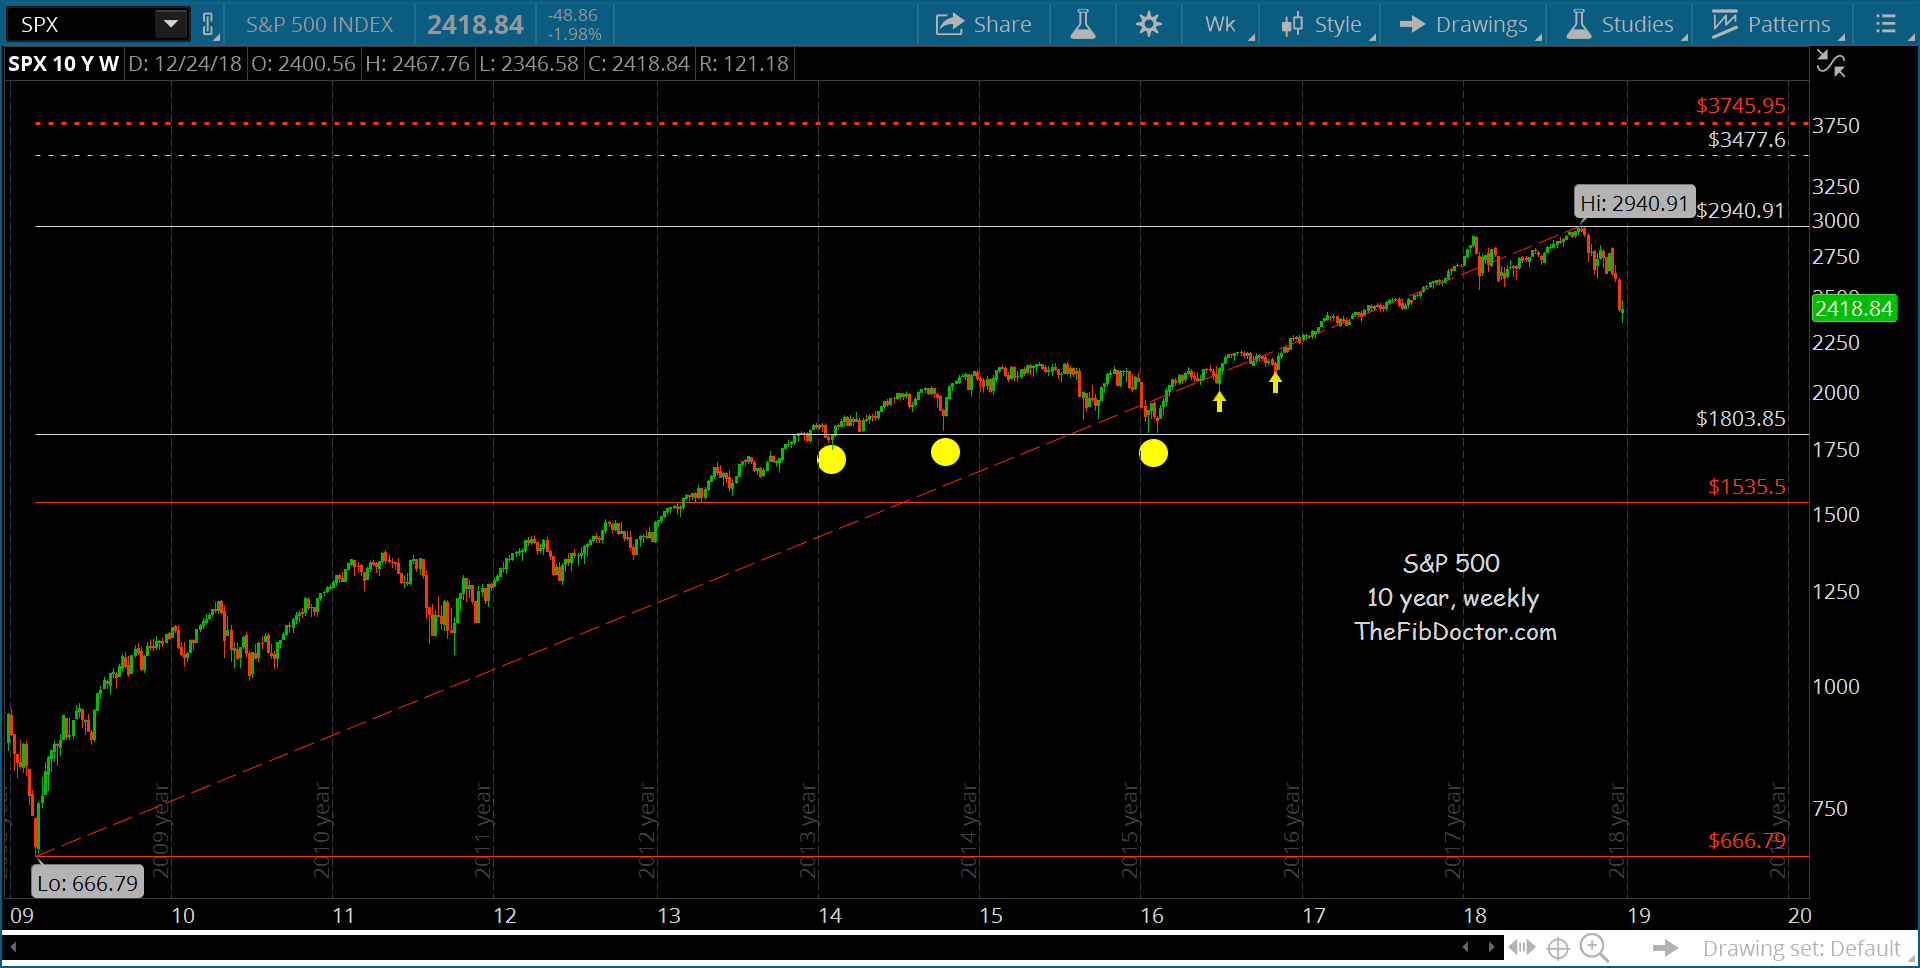 s&p 500 index deep correction bear market fibonacci price targets stocks investing chart_year 2019